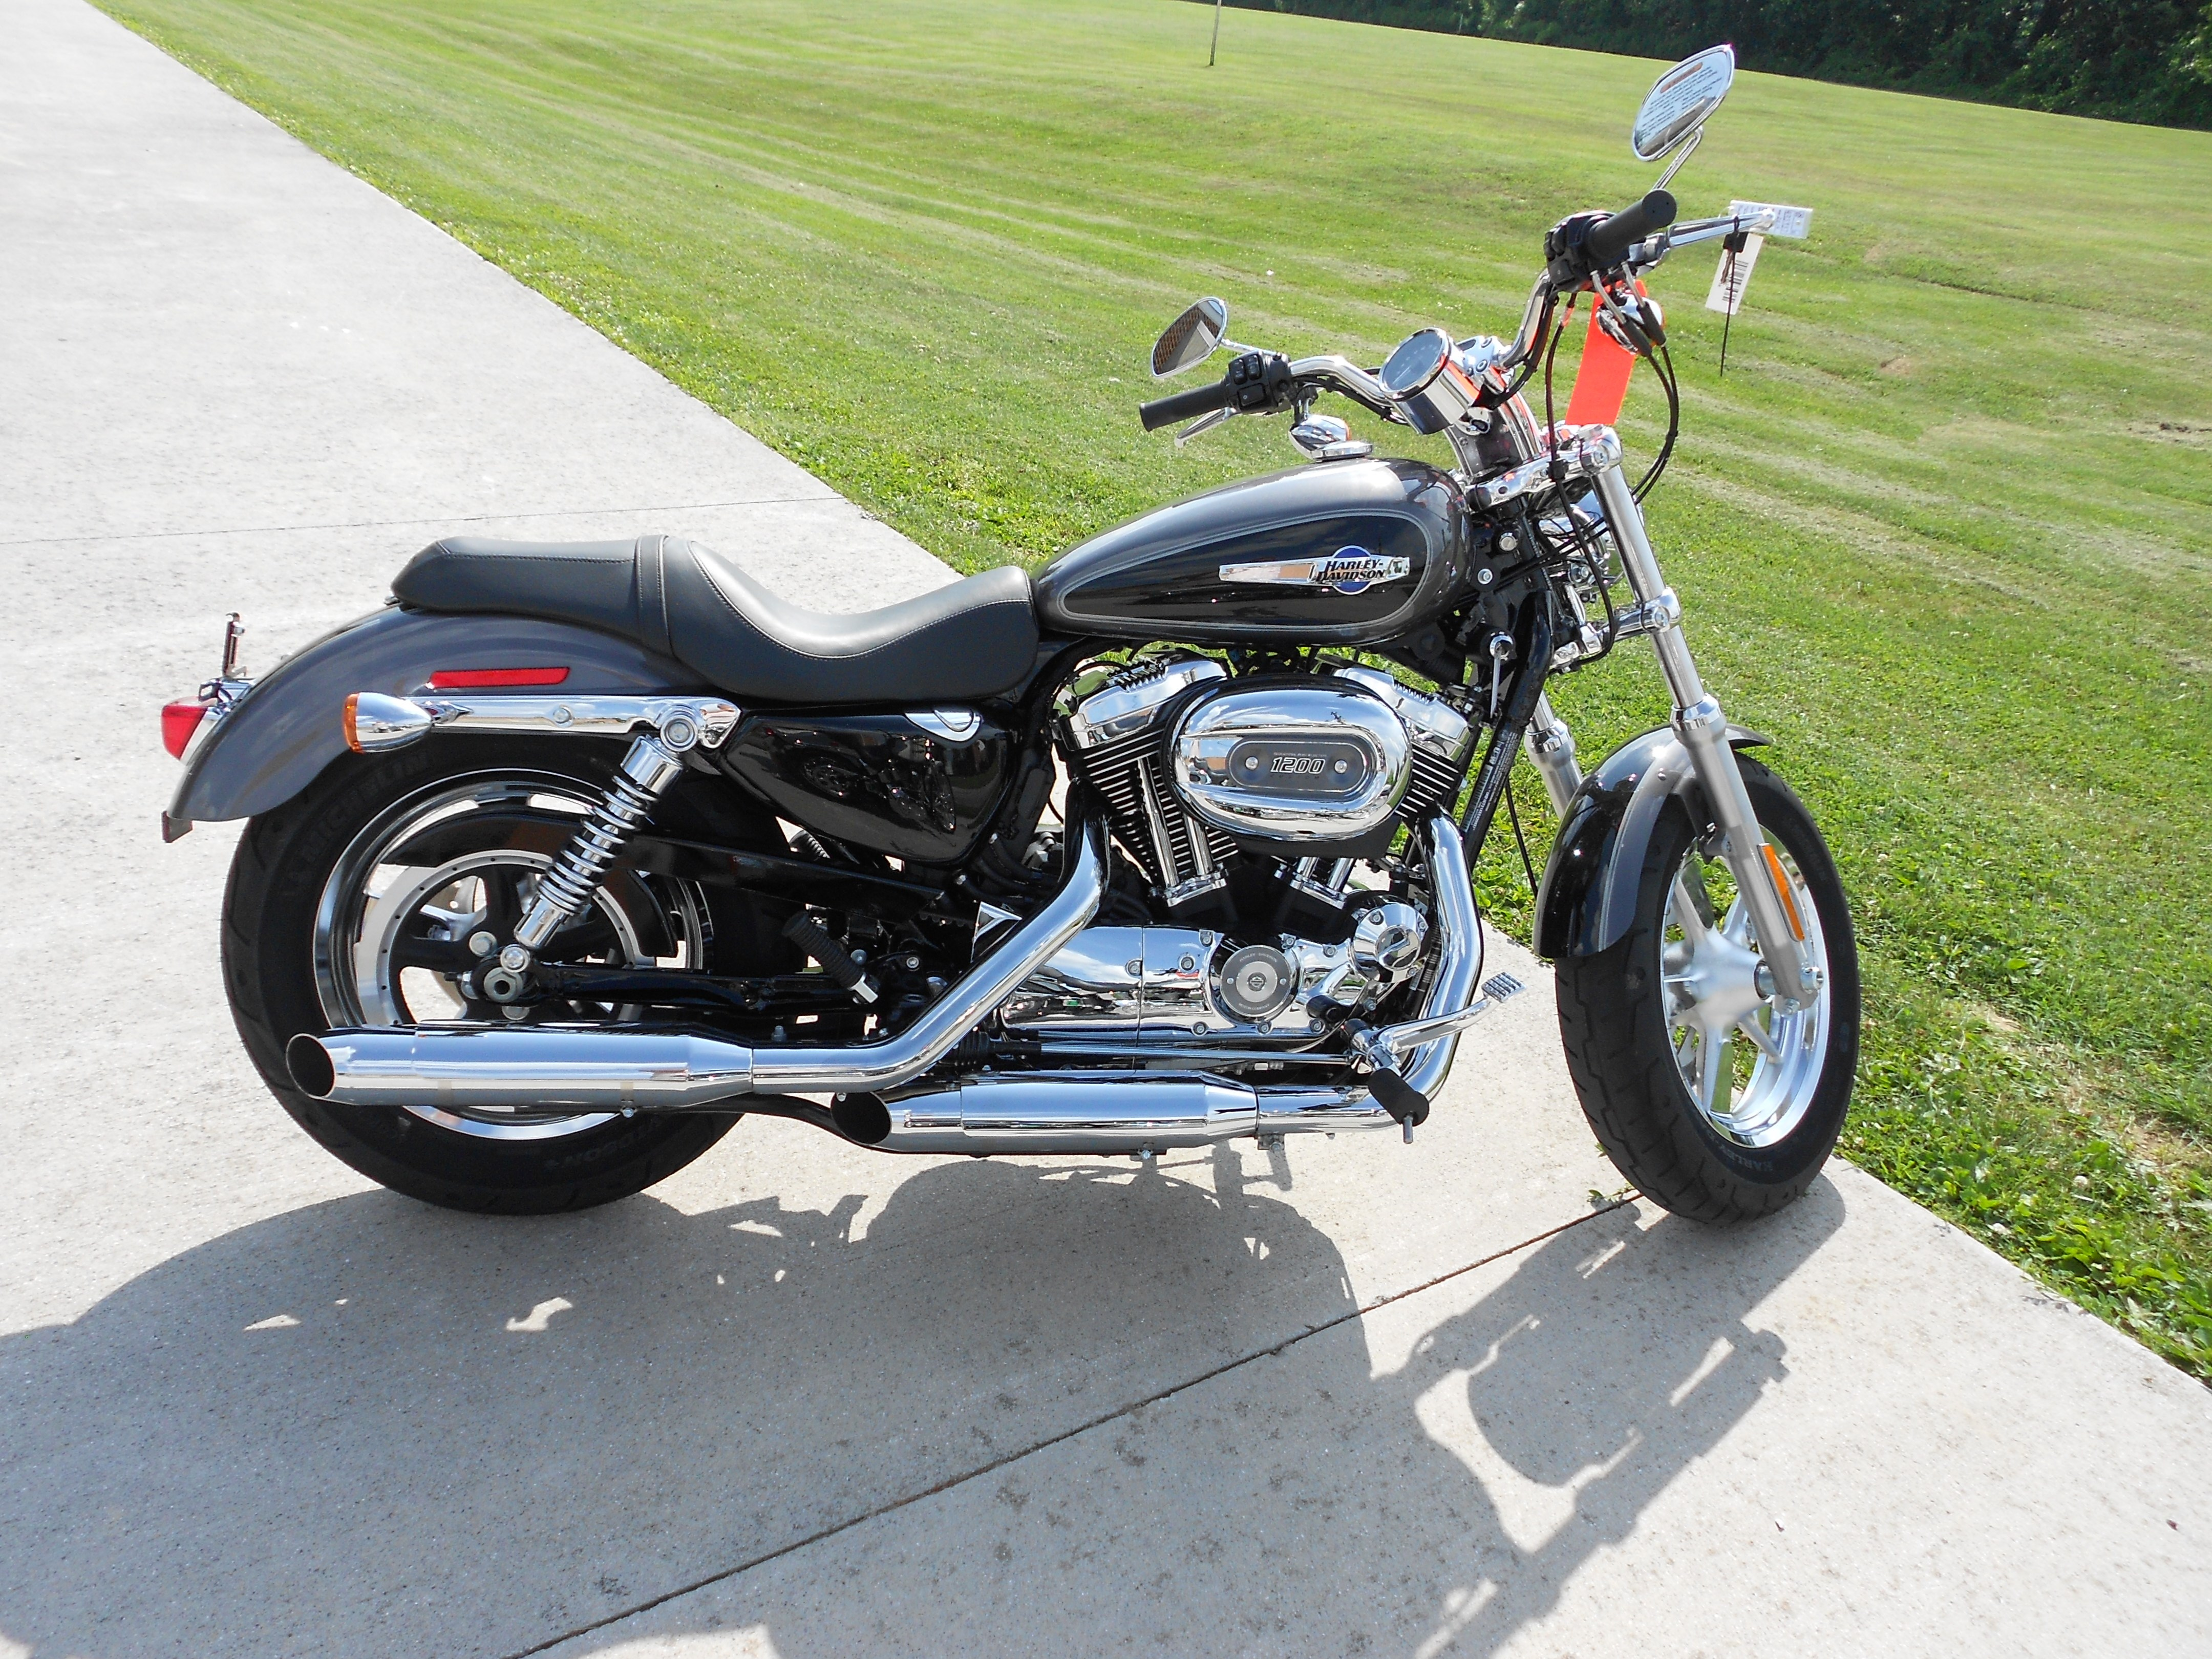 2014 Harley-Davidson® XL1200C Sportster